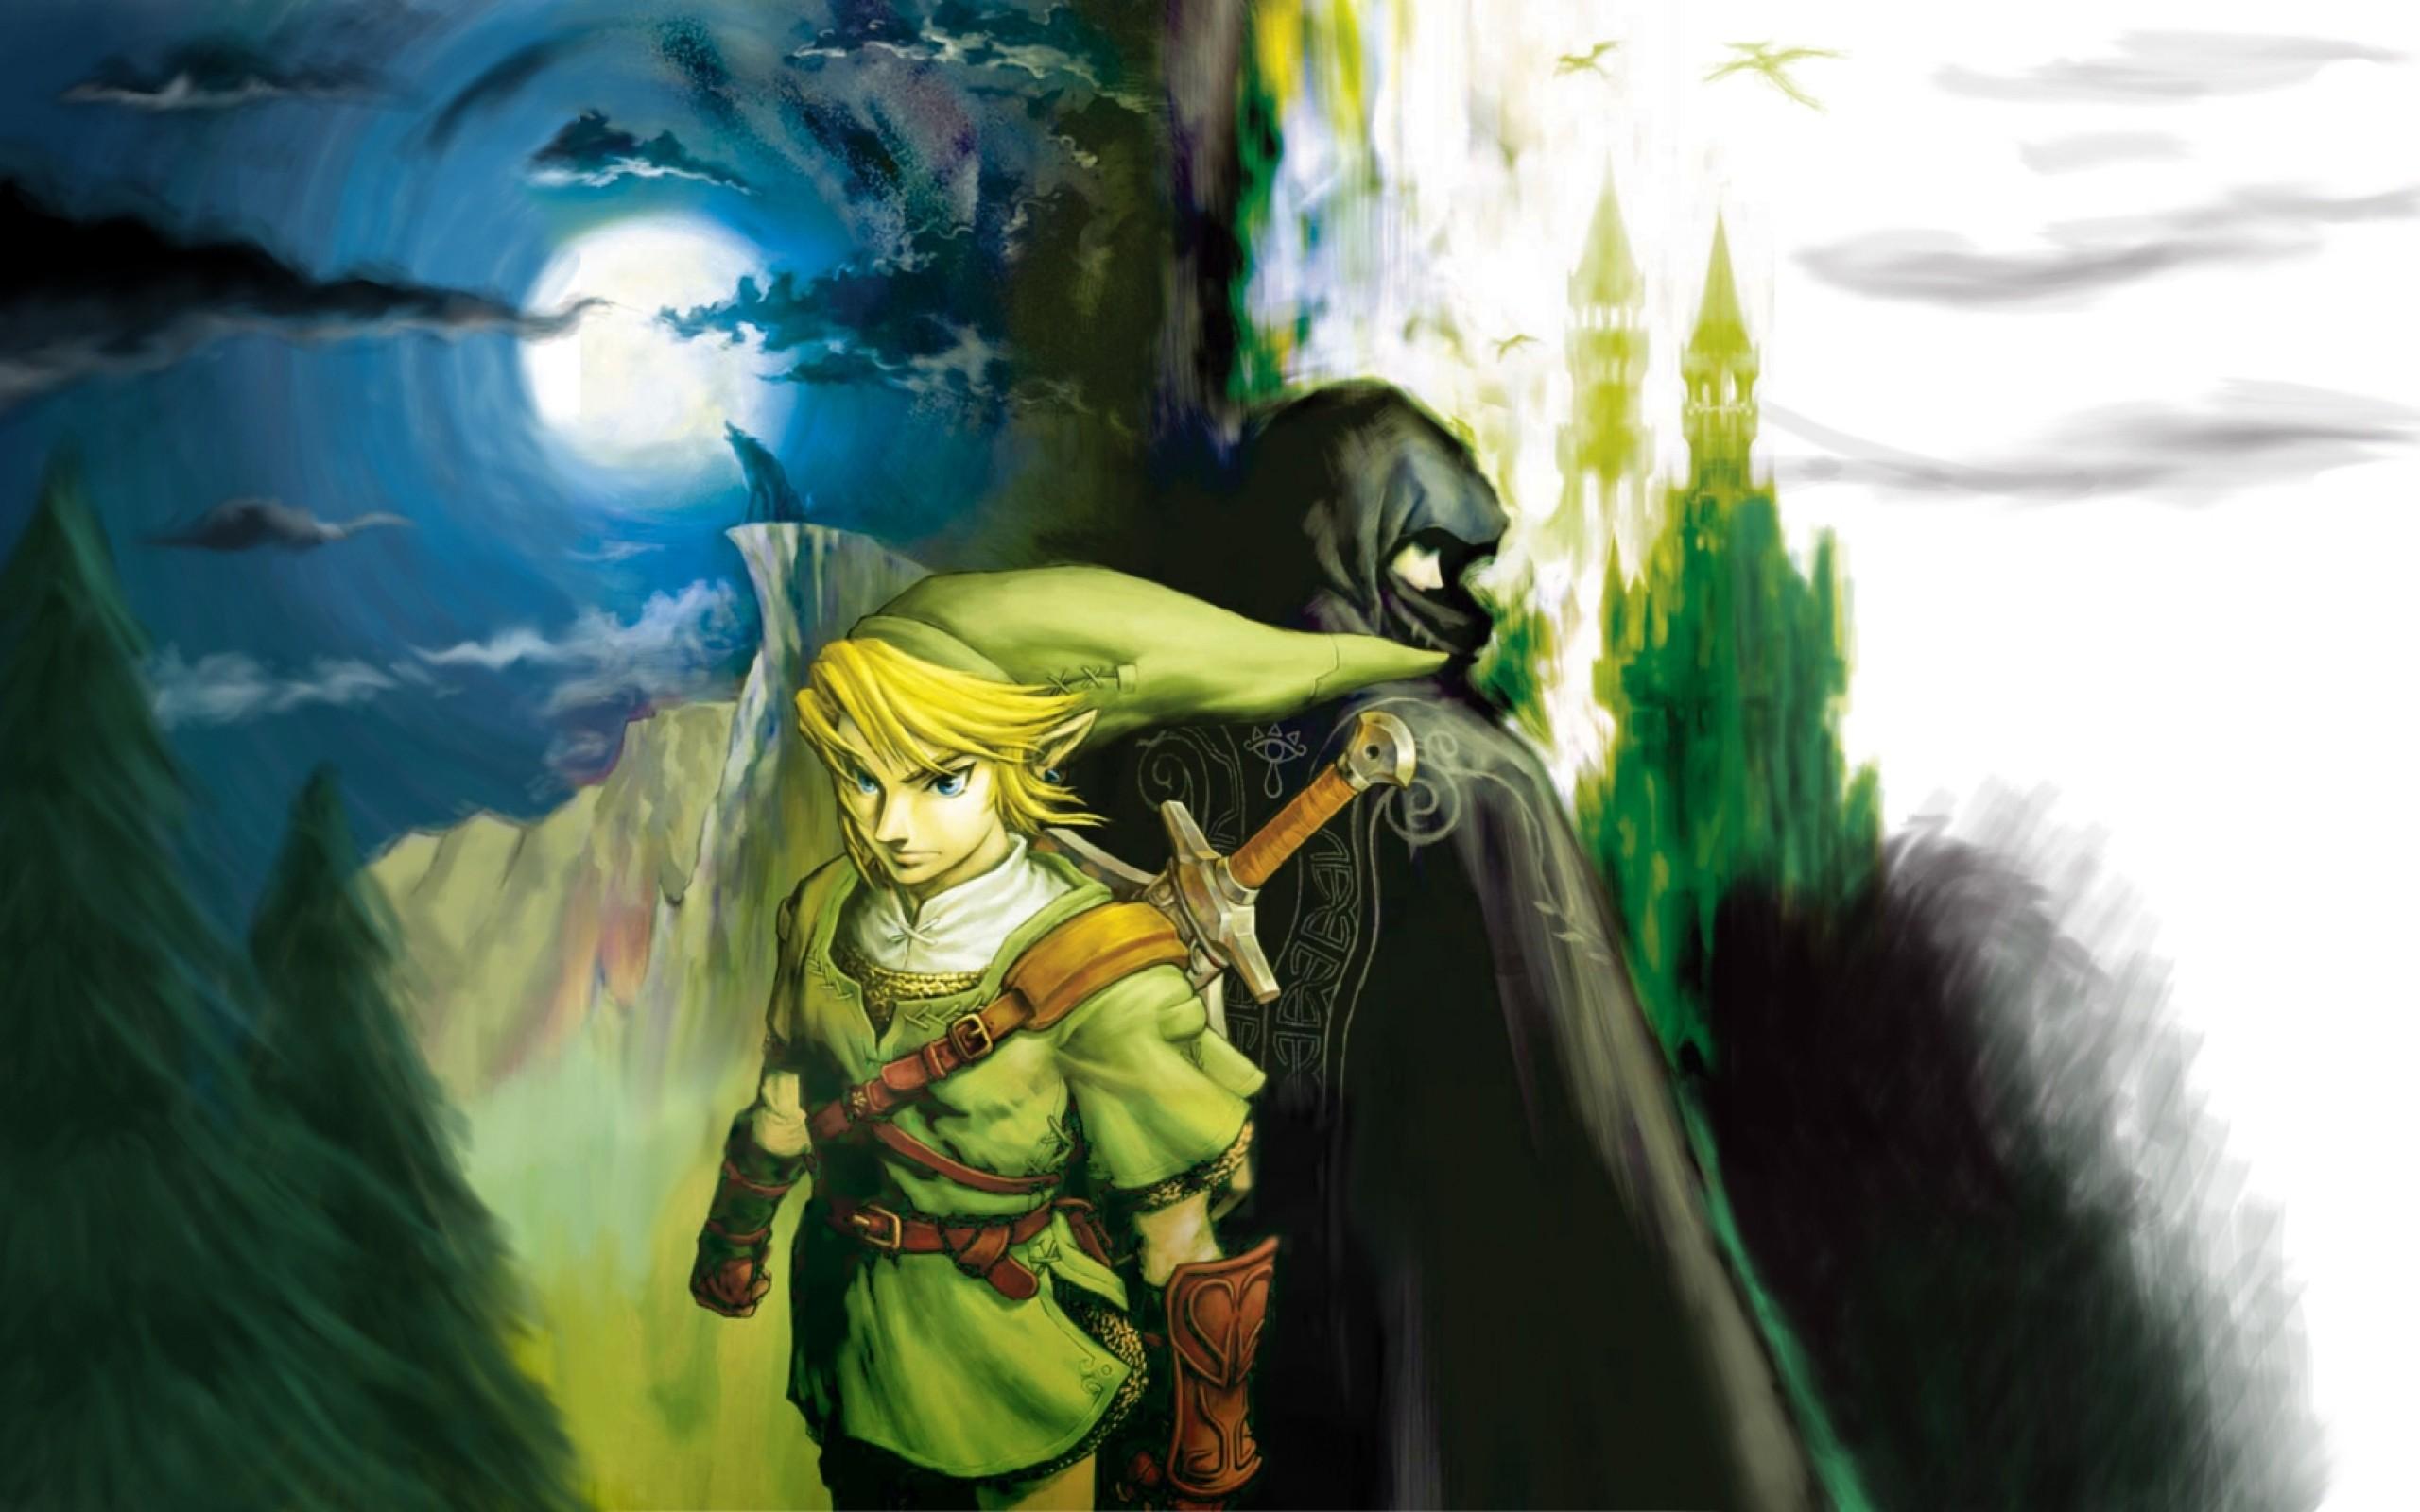 Free Download The Legend Of Zelda Twilight Princess .